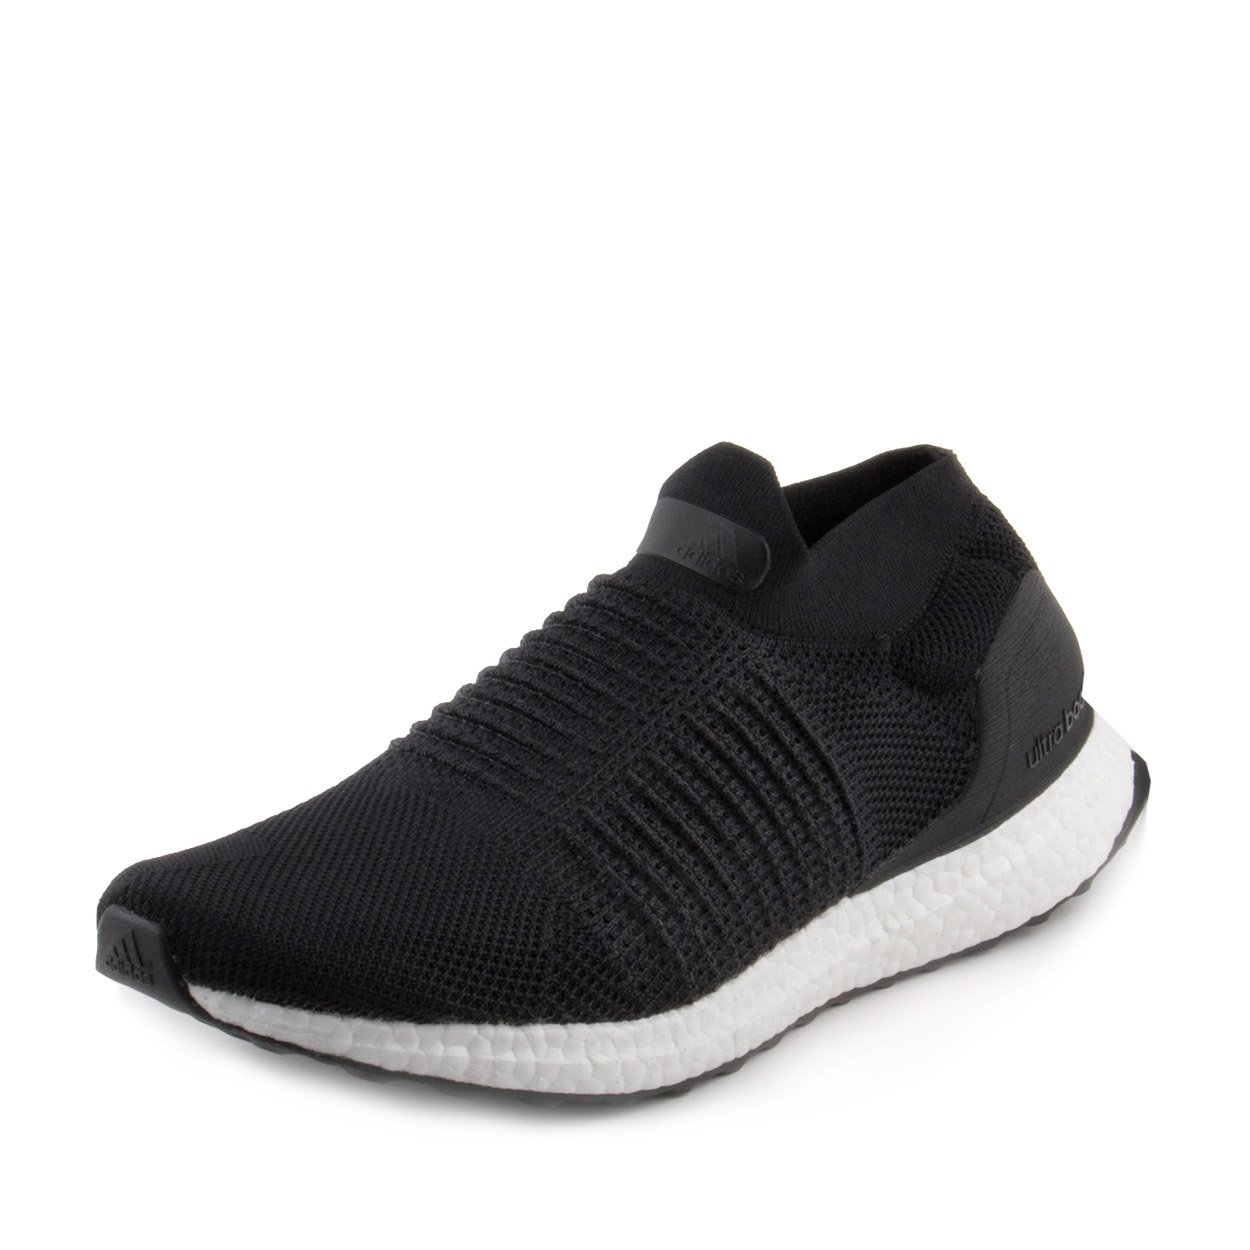 67b6206f3 Galleon - Adidas Men s Ultraboost Laceless Running Shoe Black Size 9.5 M US